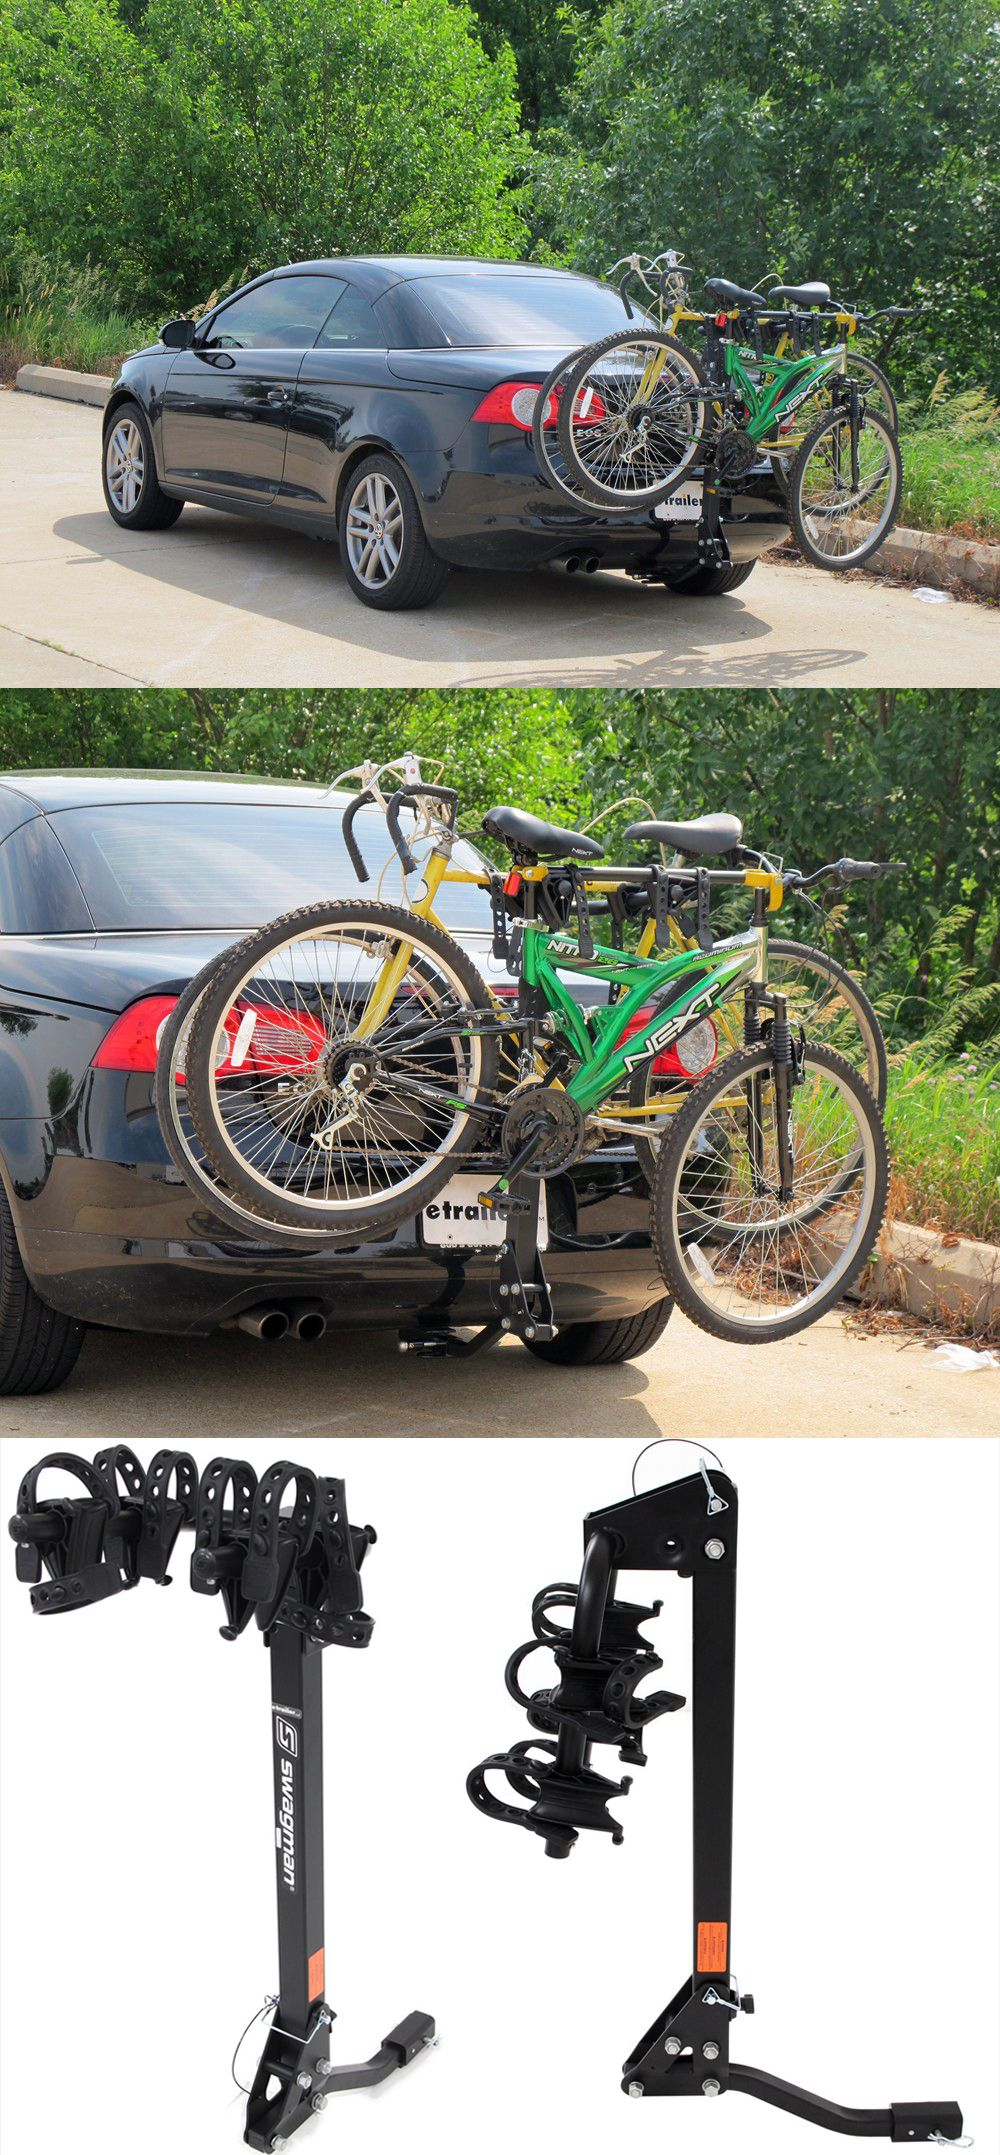 Swagman Trailhead 2 Bike Rack For 1 1 4 And 2 Hitches Tilting